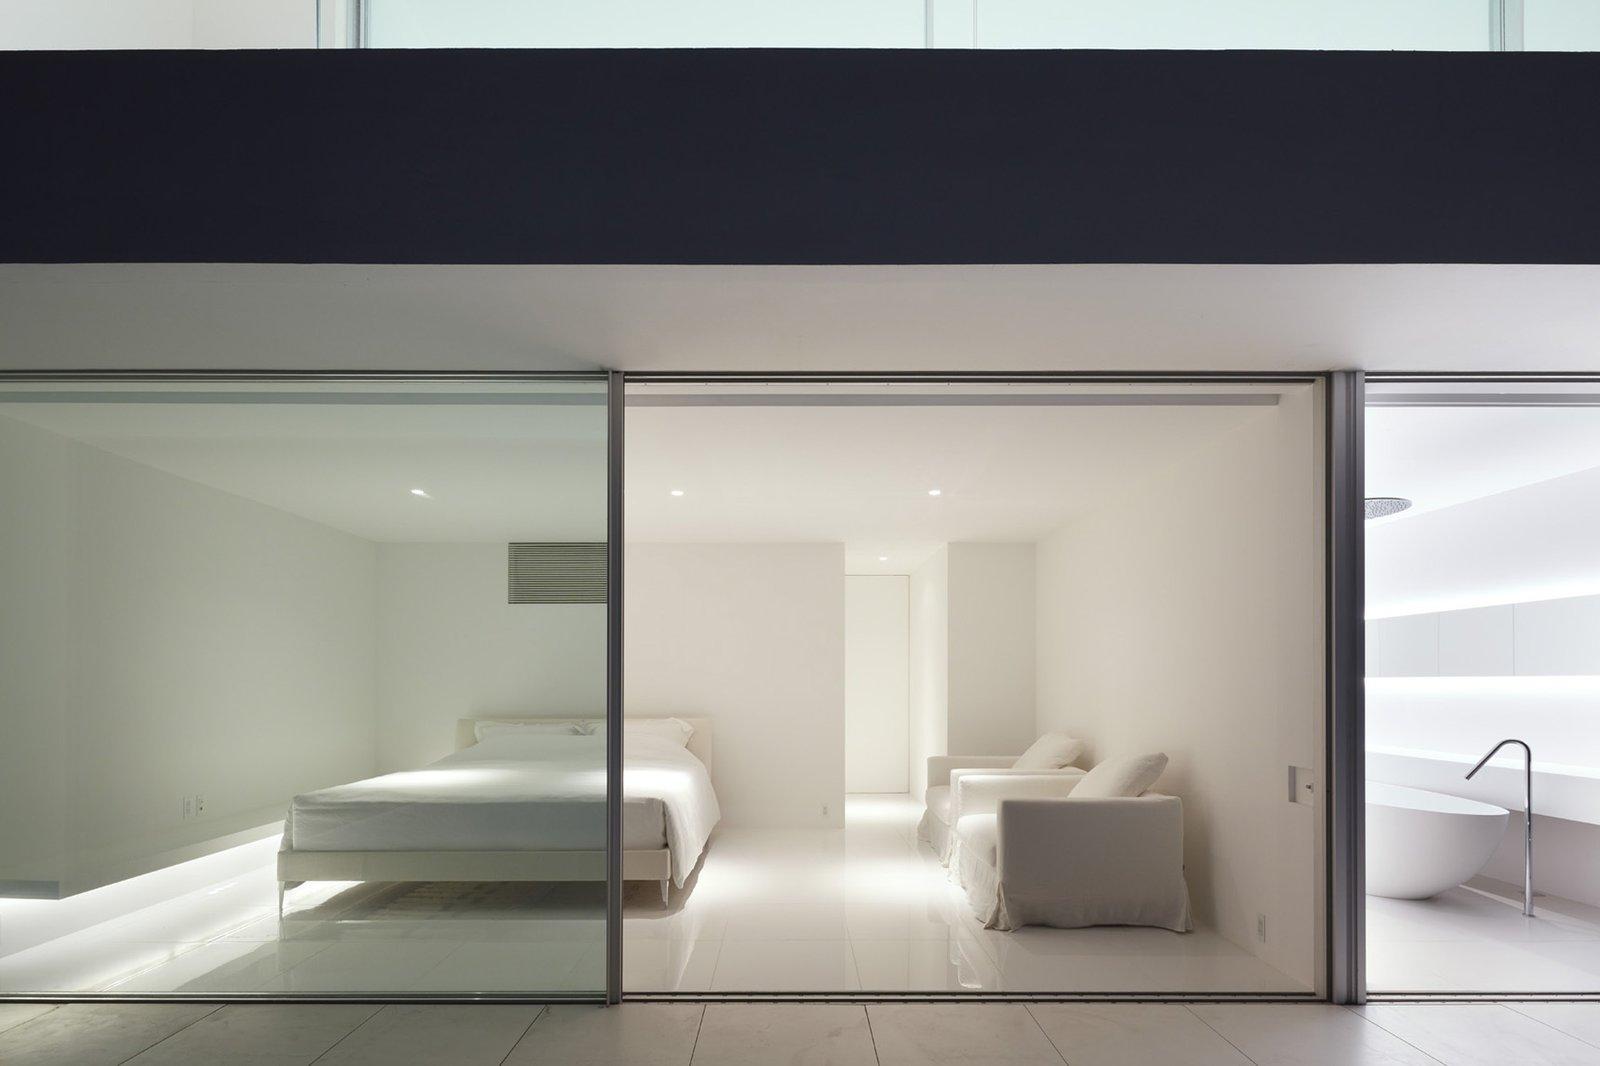 Bedroom, Bed, Recessed Lighting, and Ceramic Tile Floor  Seaside House